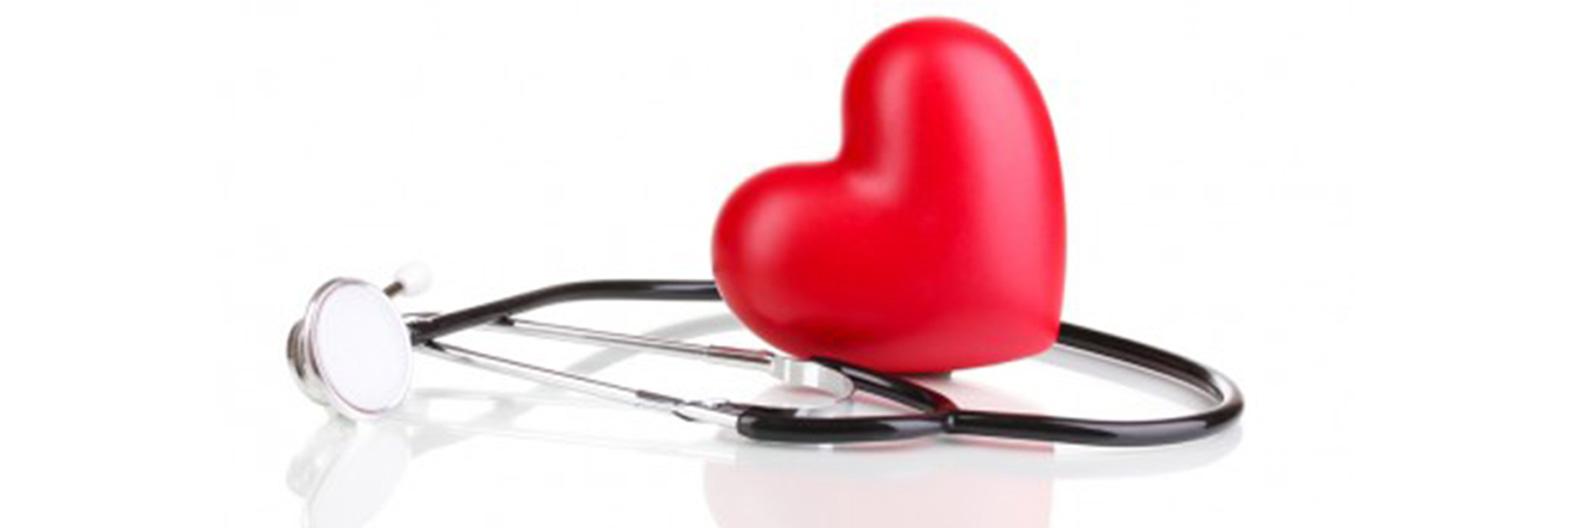 omega 3 riebalų širdies sveikata hipertenzijos institutas